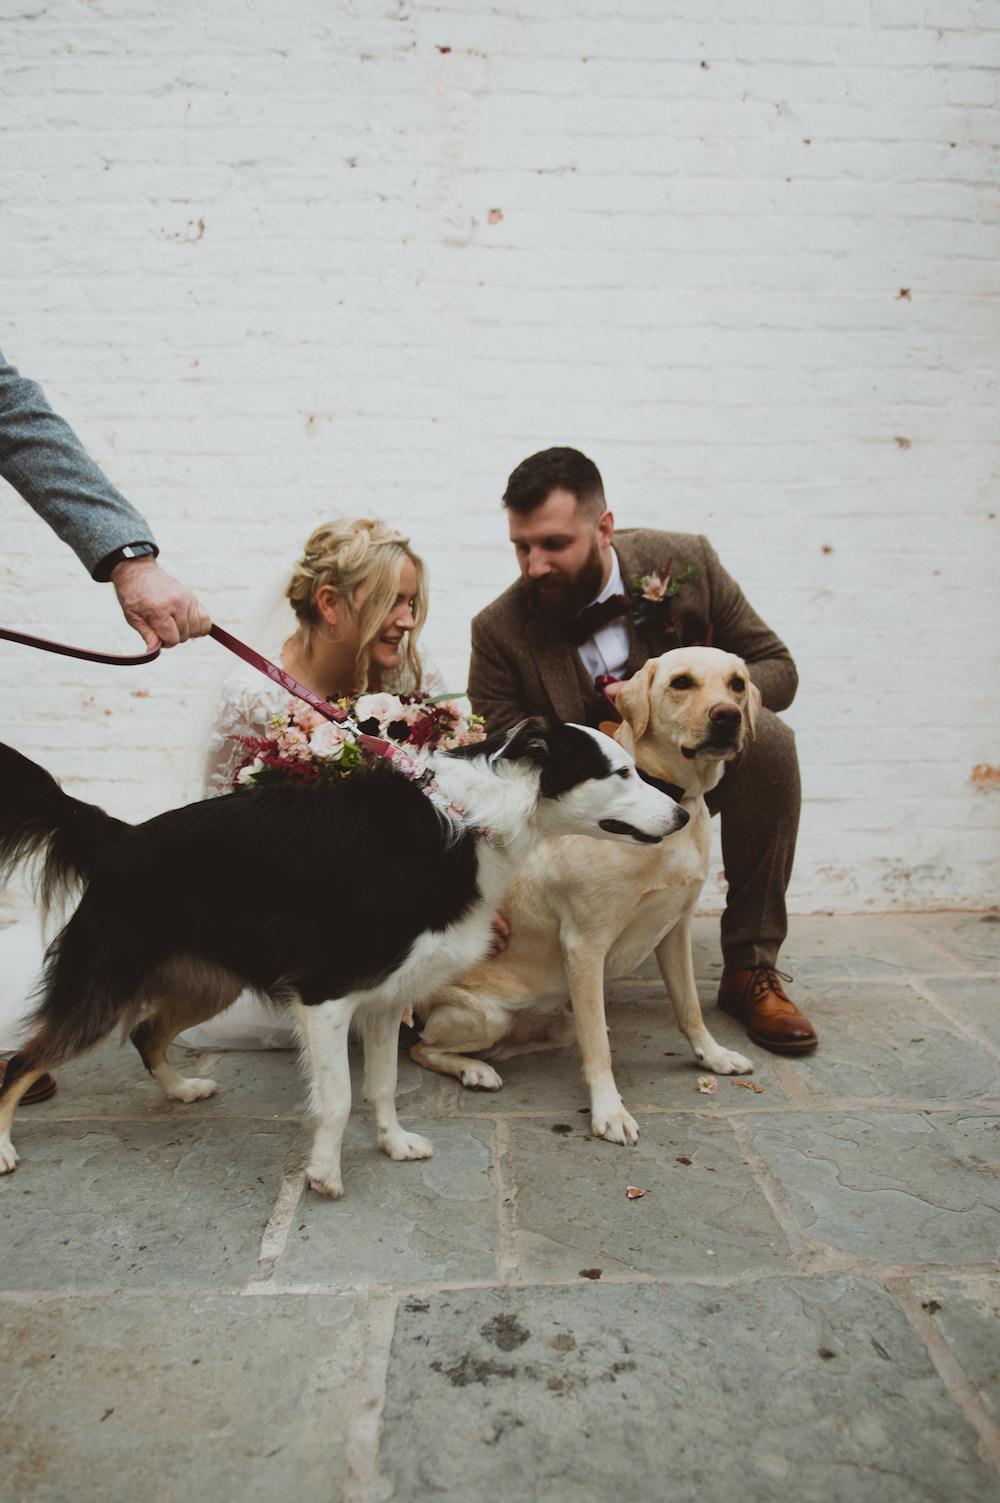 Dogs Pets Garthmyl Hall Wedding Sasha Weddings